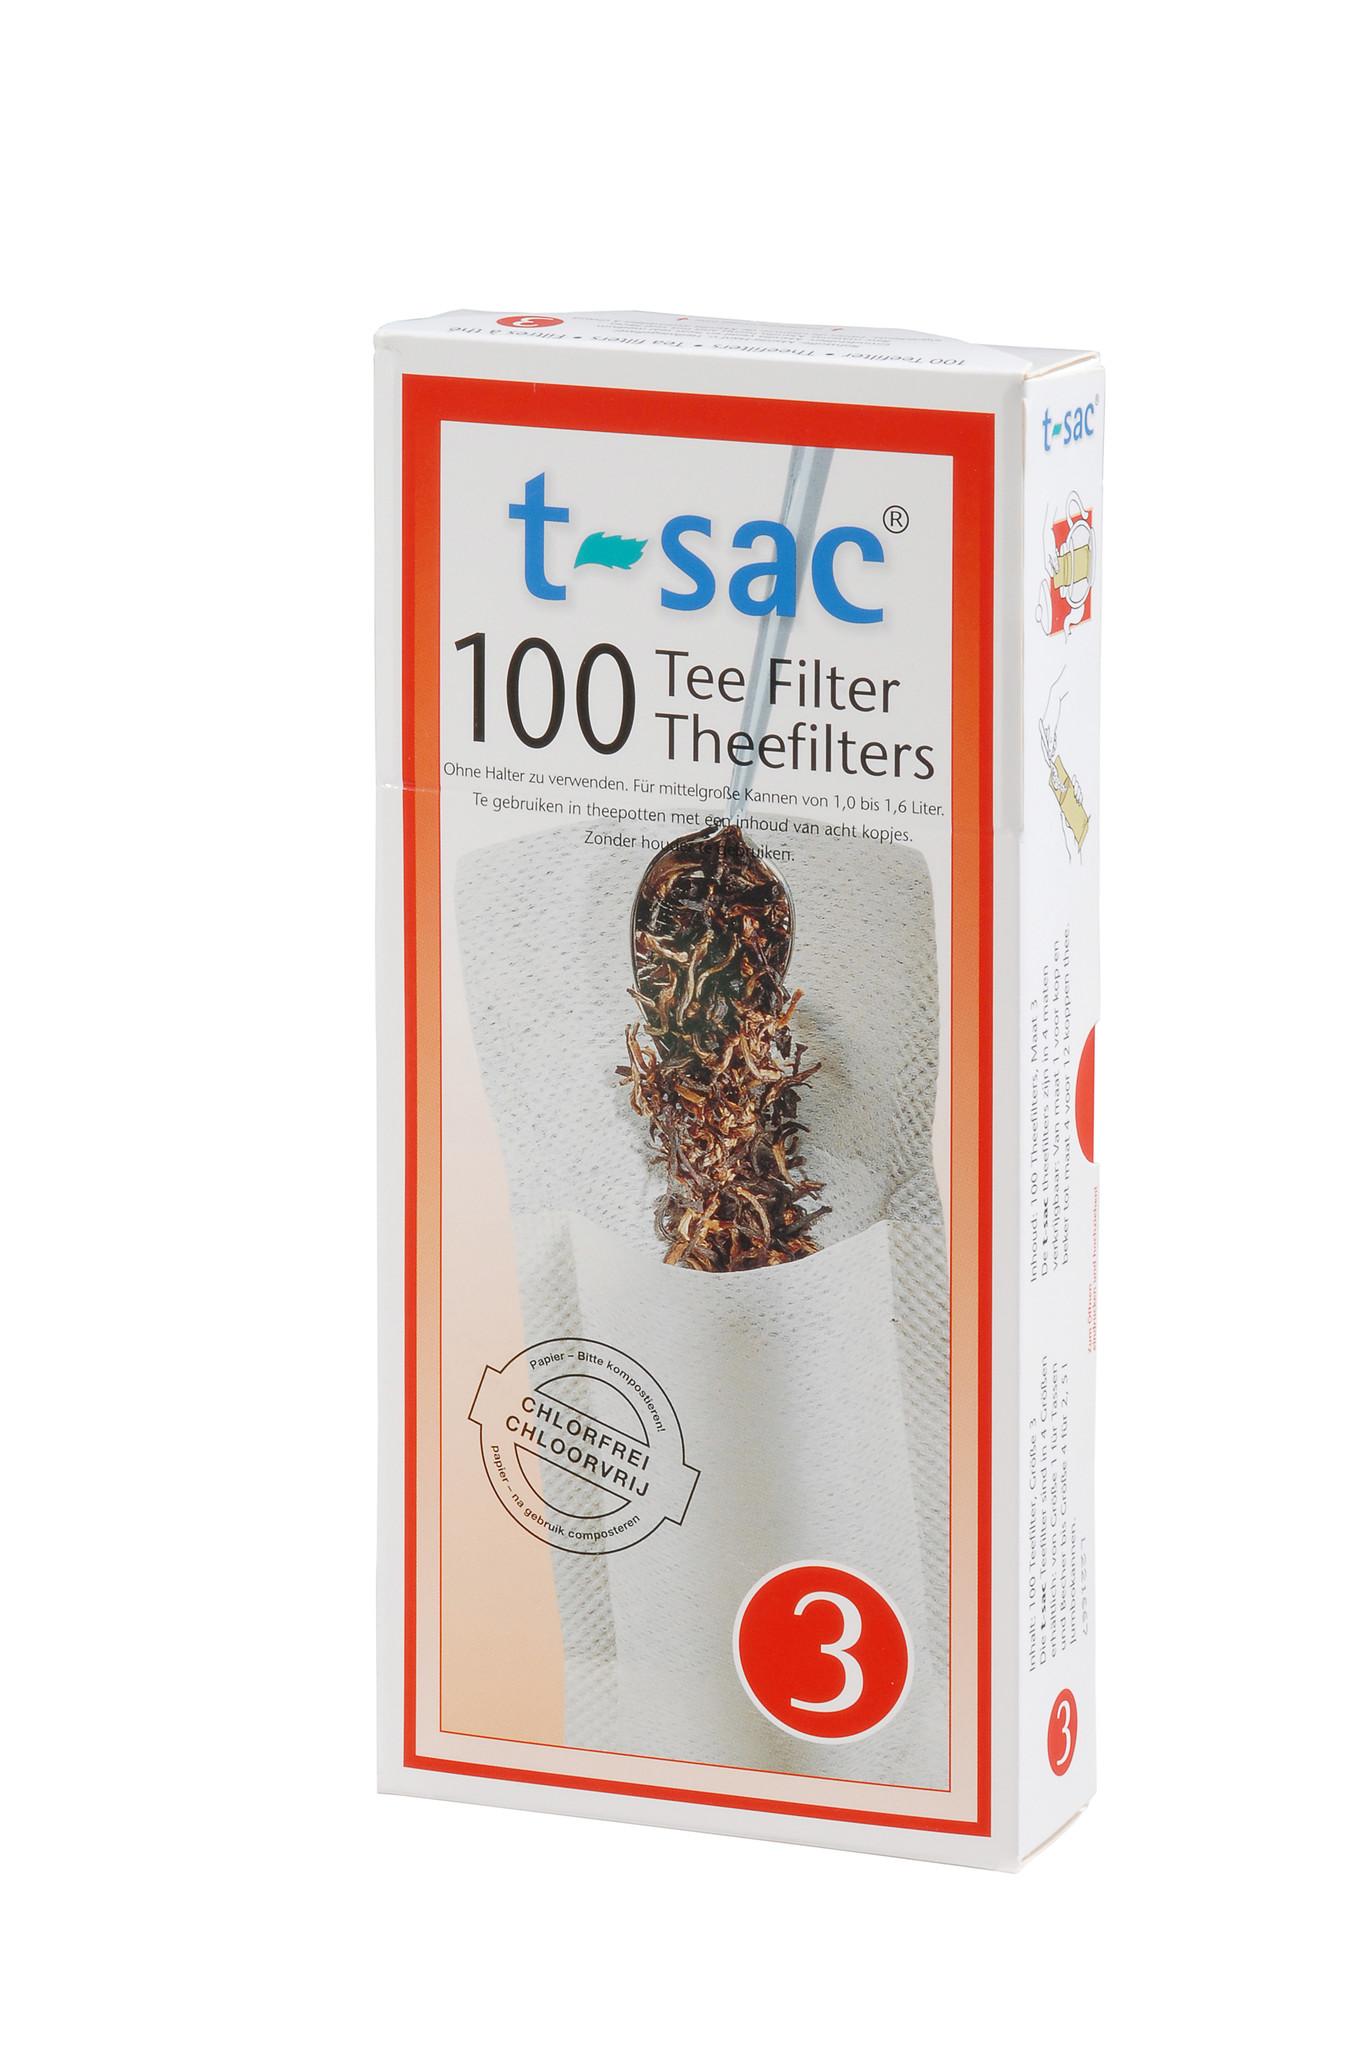 T-Sac theefilter nr. 3 (100 stuks)